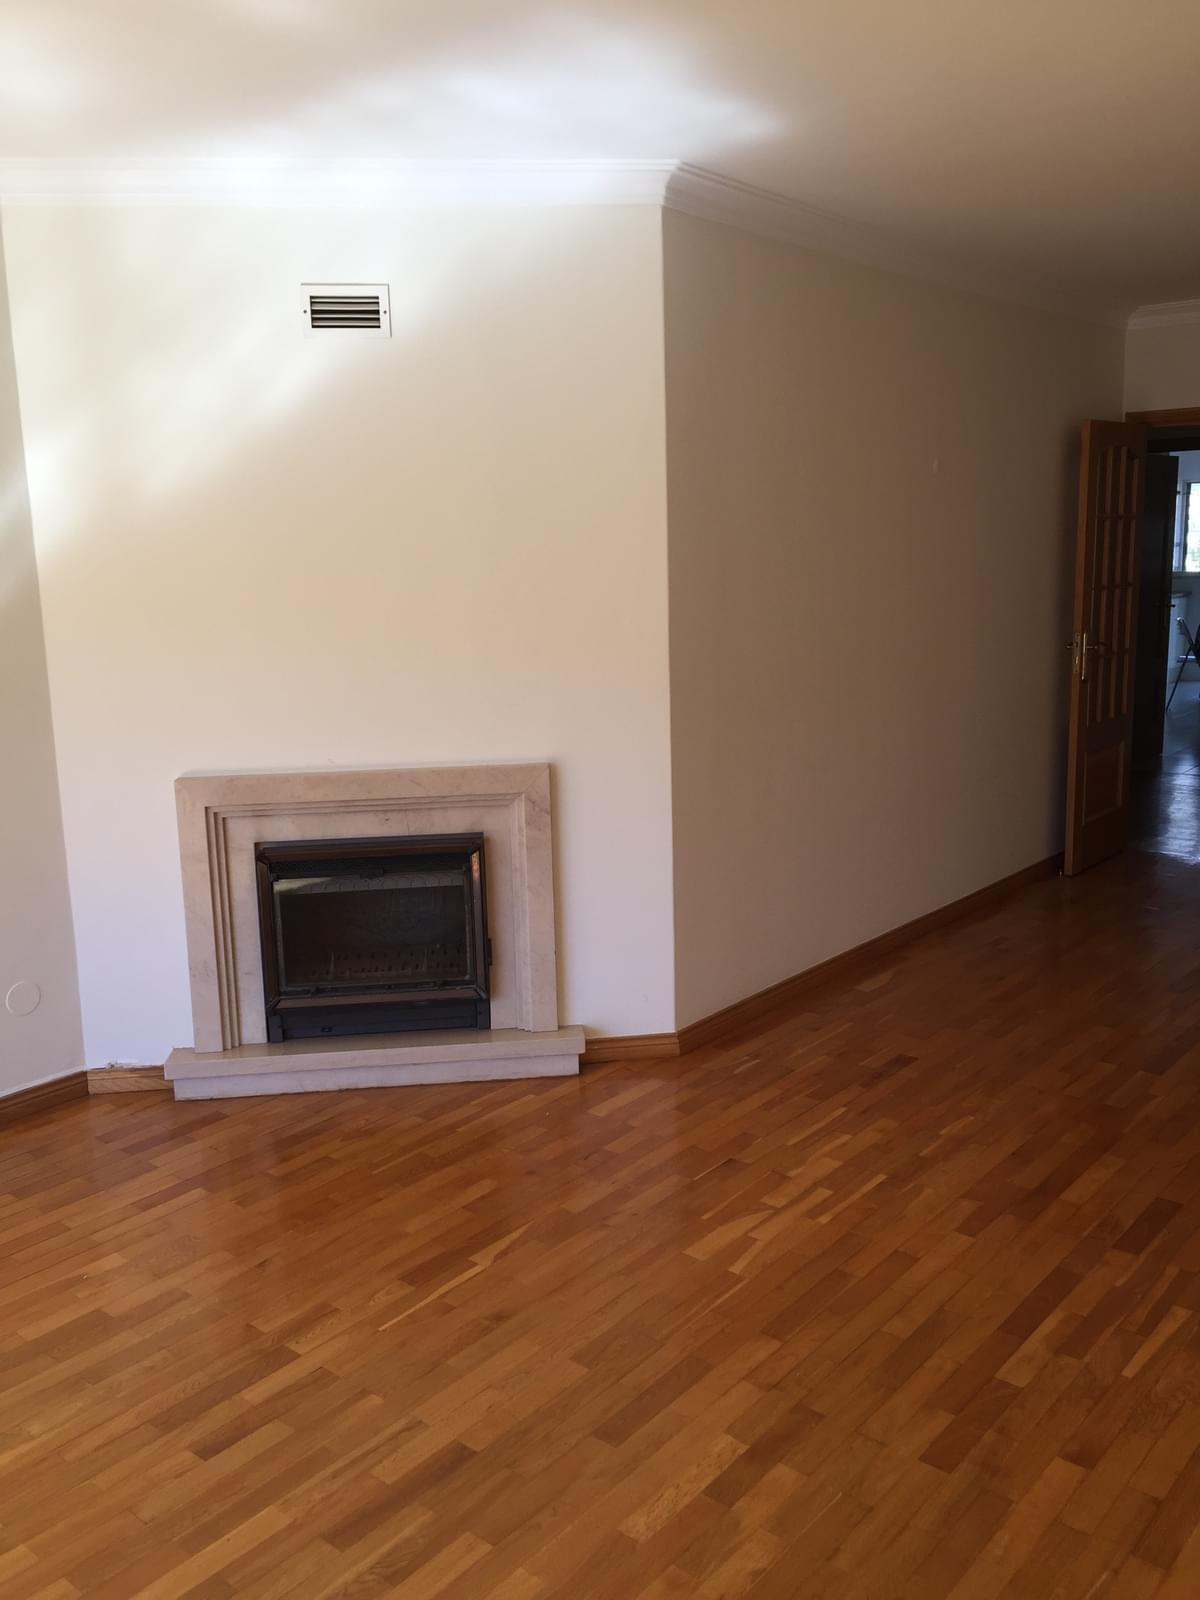 pf18344-apartamento-t3-oeiras-a5948f8e-d49b-4d97-9434-a4402bc81d7c